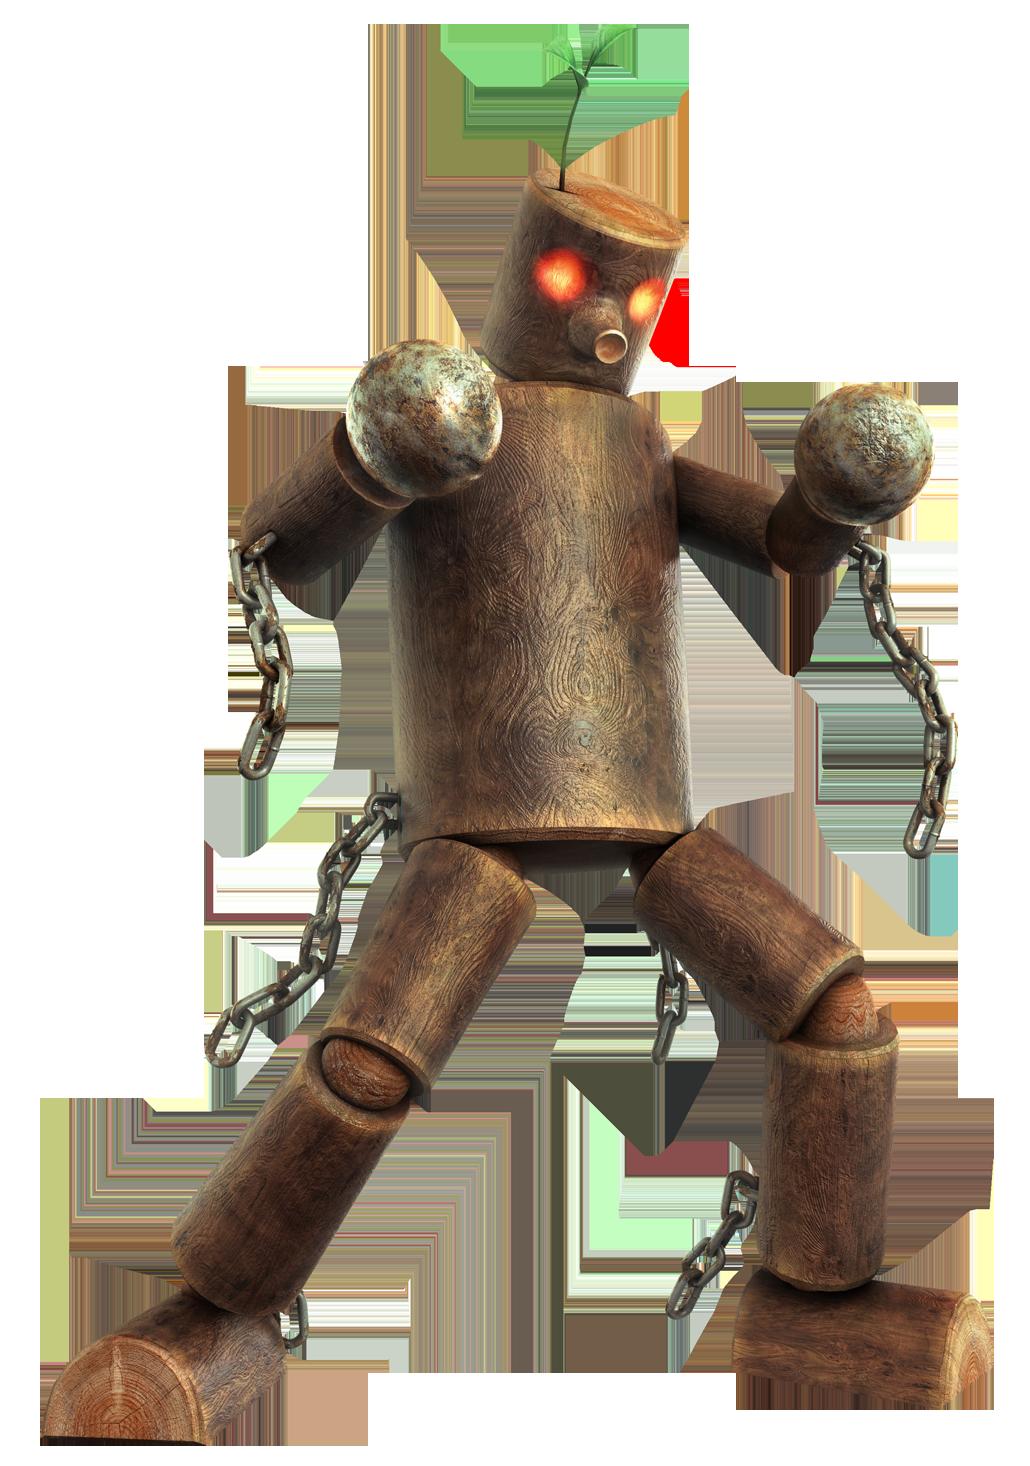 tekken 6 characters wikia